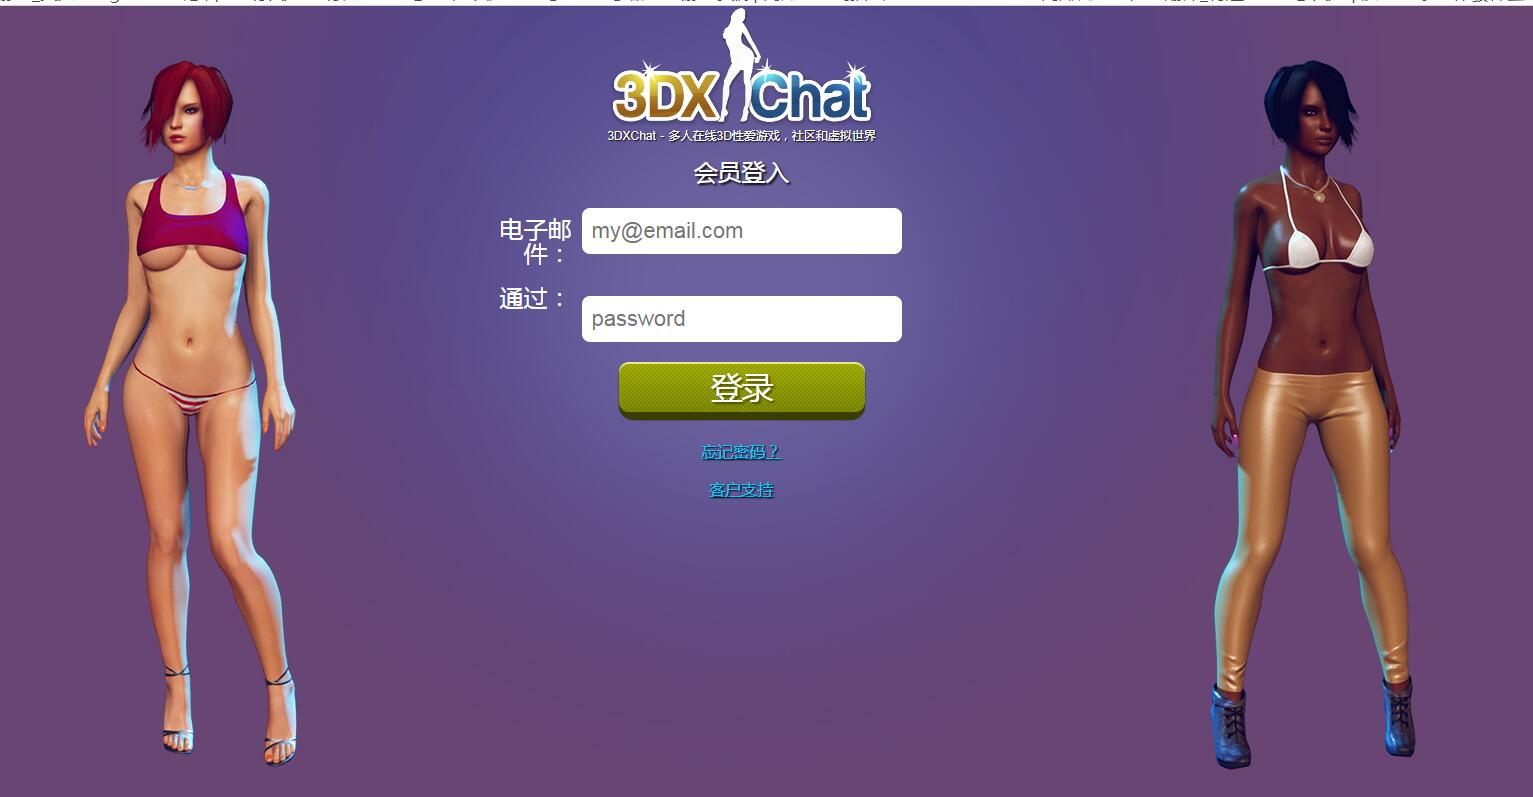 3DXChat V2.6 离线破·解版!(真·不要钱)【西欧网游/3D模拟/全动态/2.5G/0507】